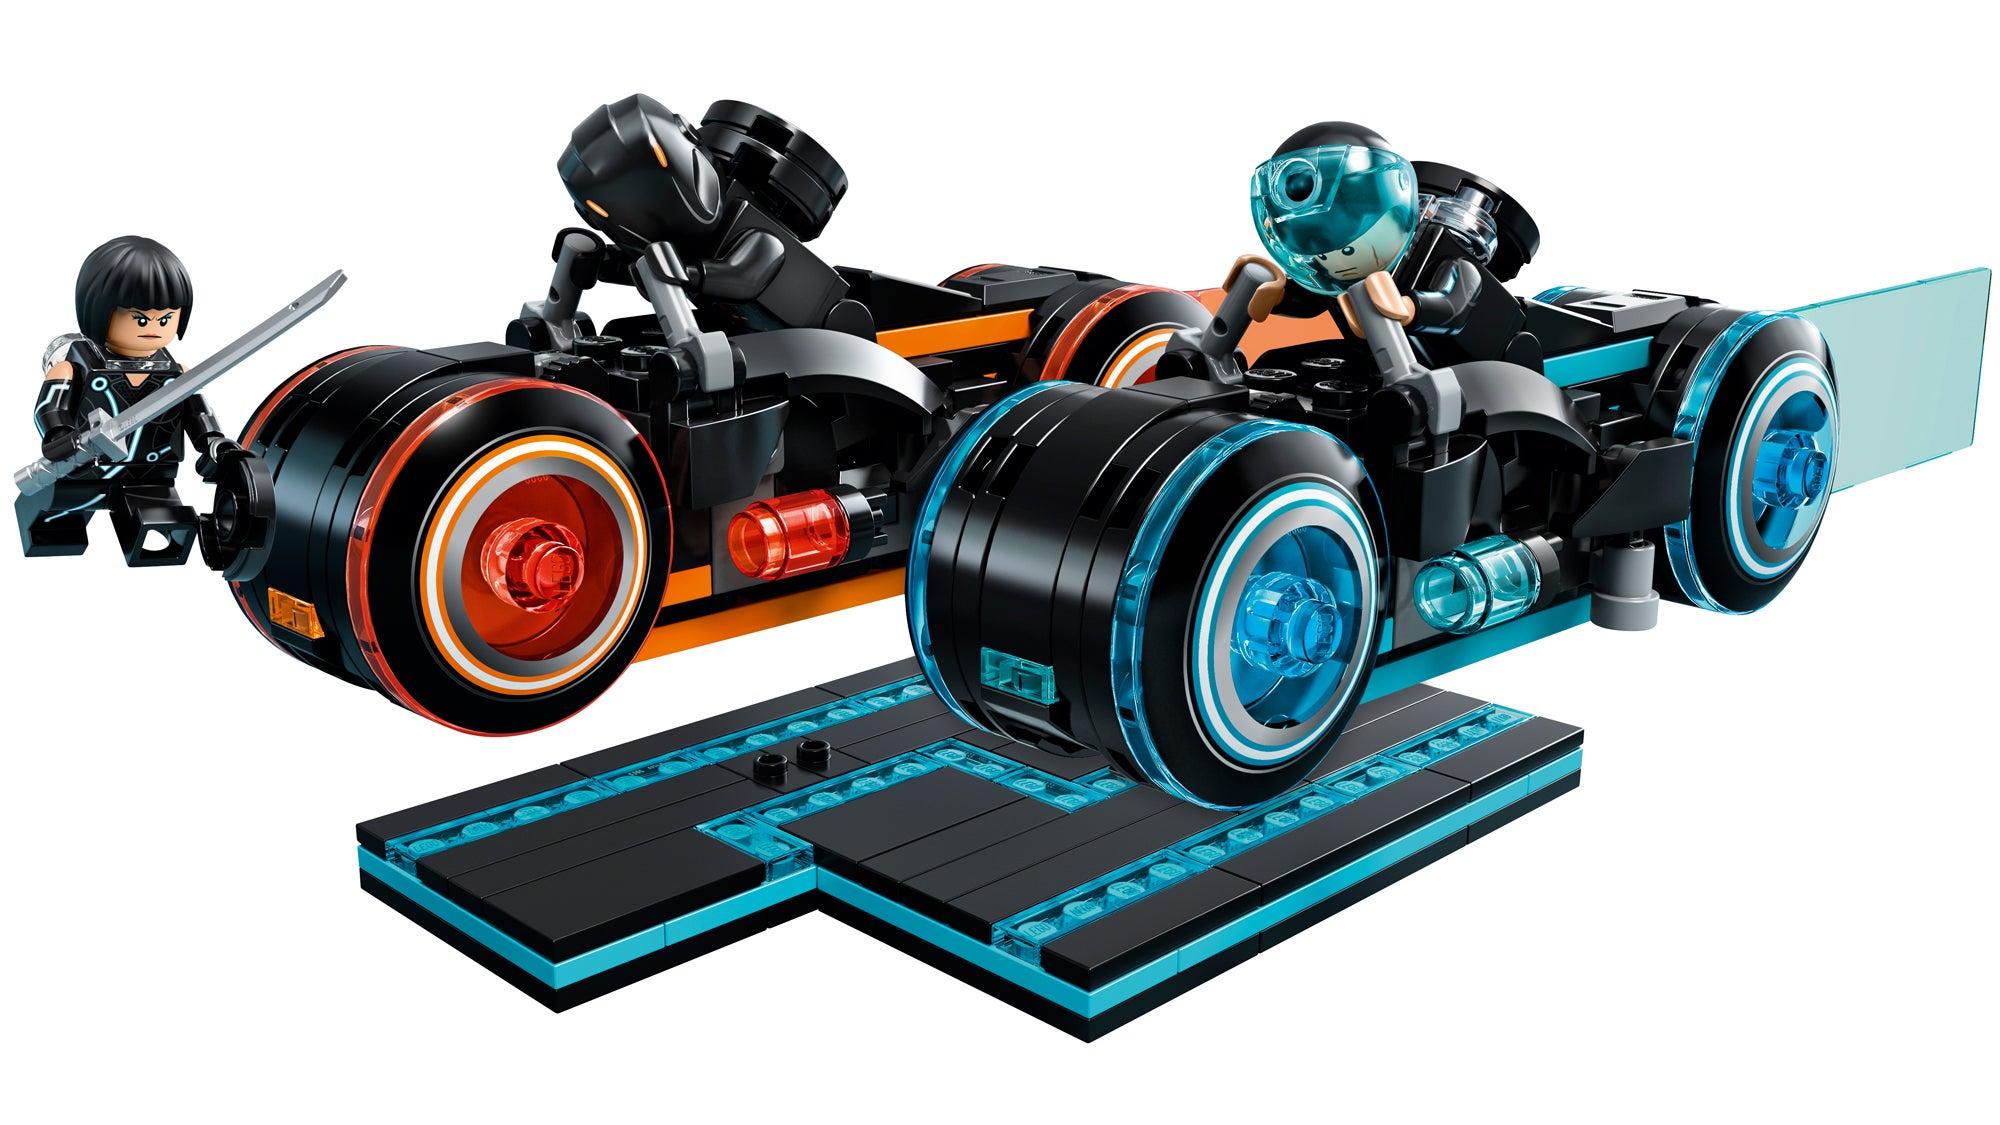 Start Saving Your Dollars Because LEGO's Tron: Legacy Light Cycles Set Finally Arrives Next Week